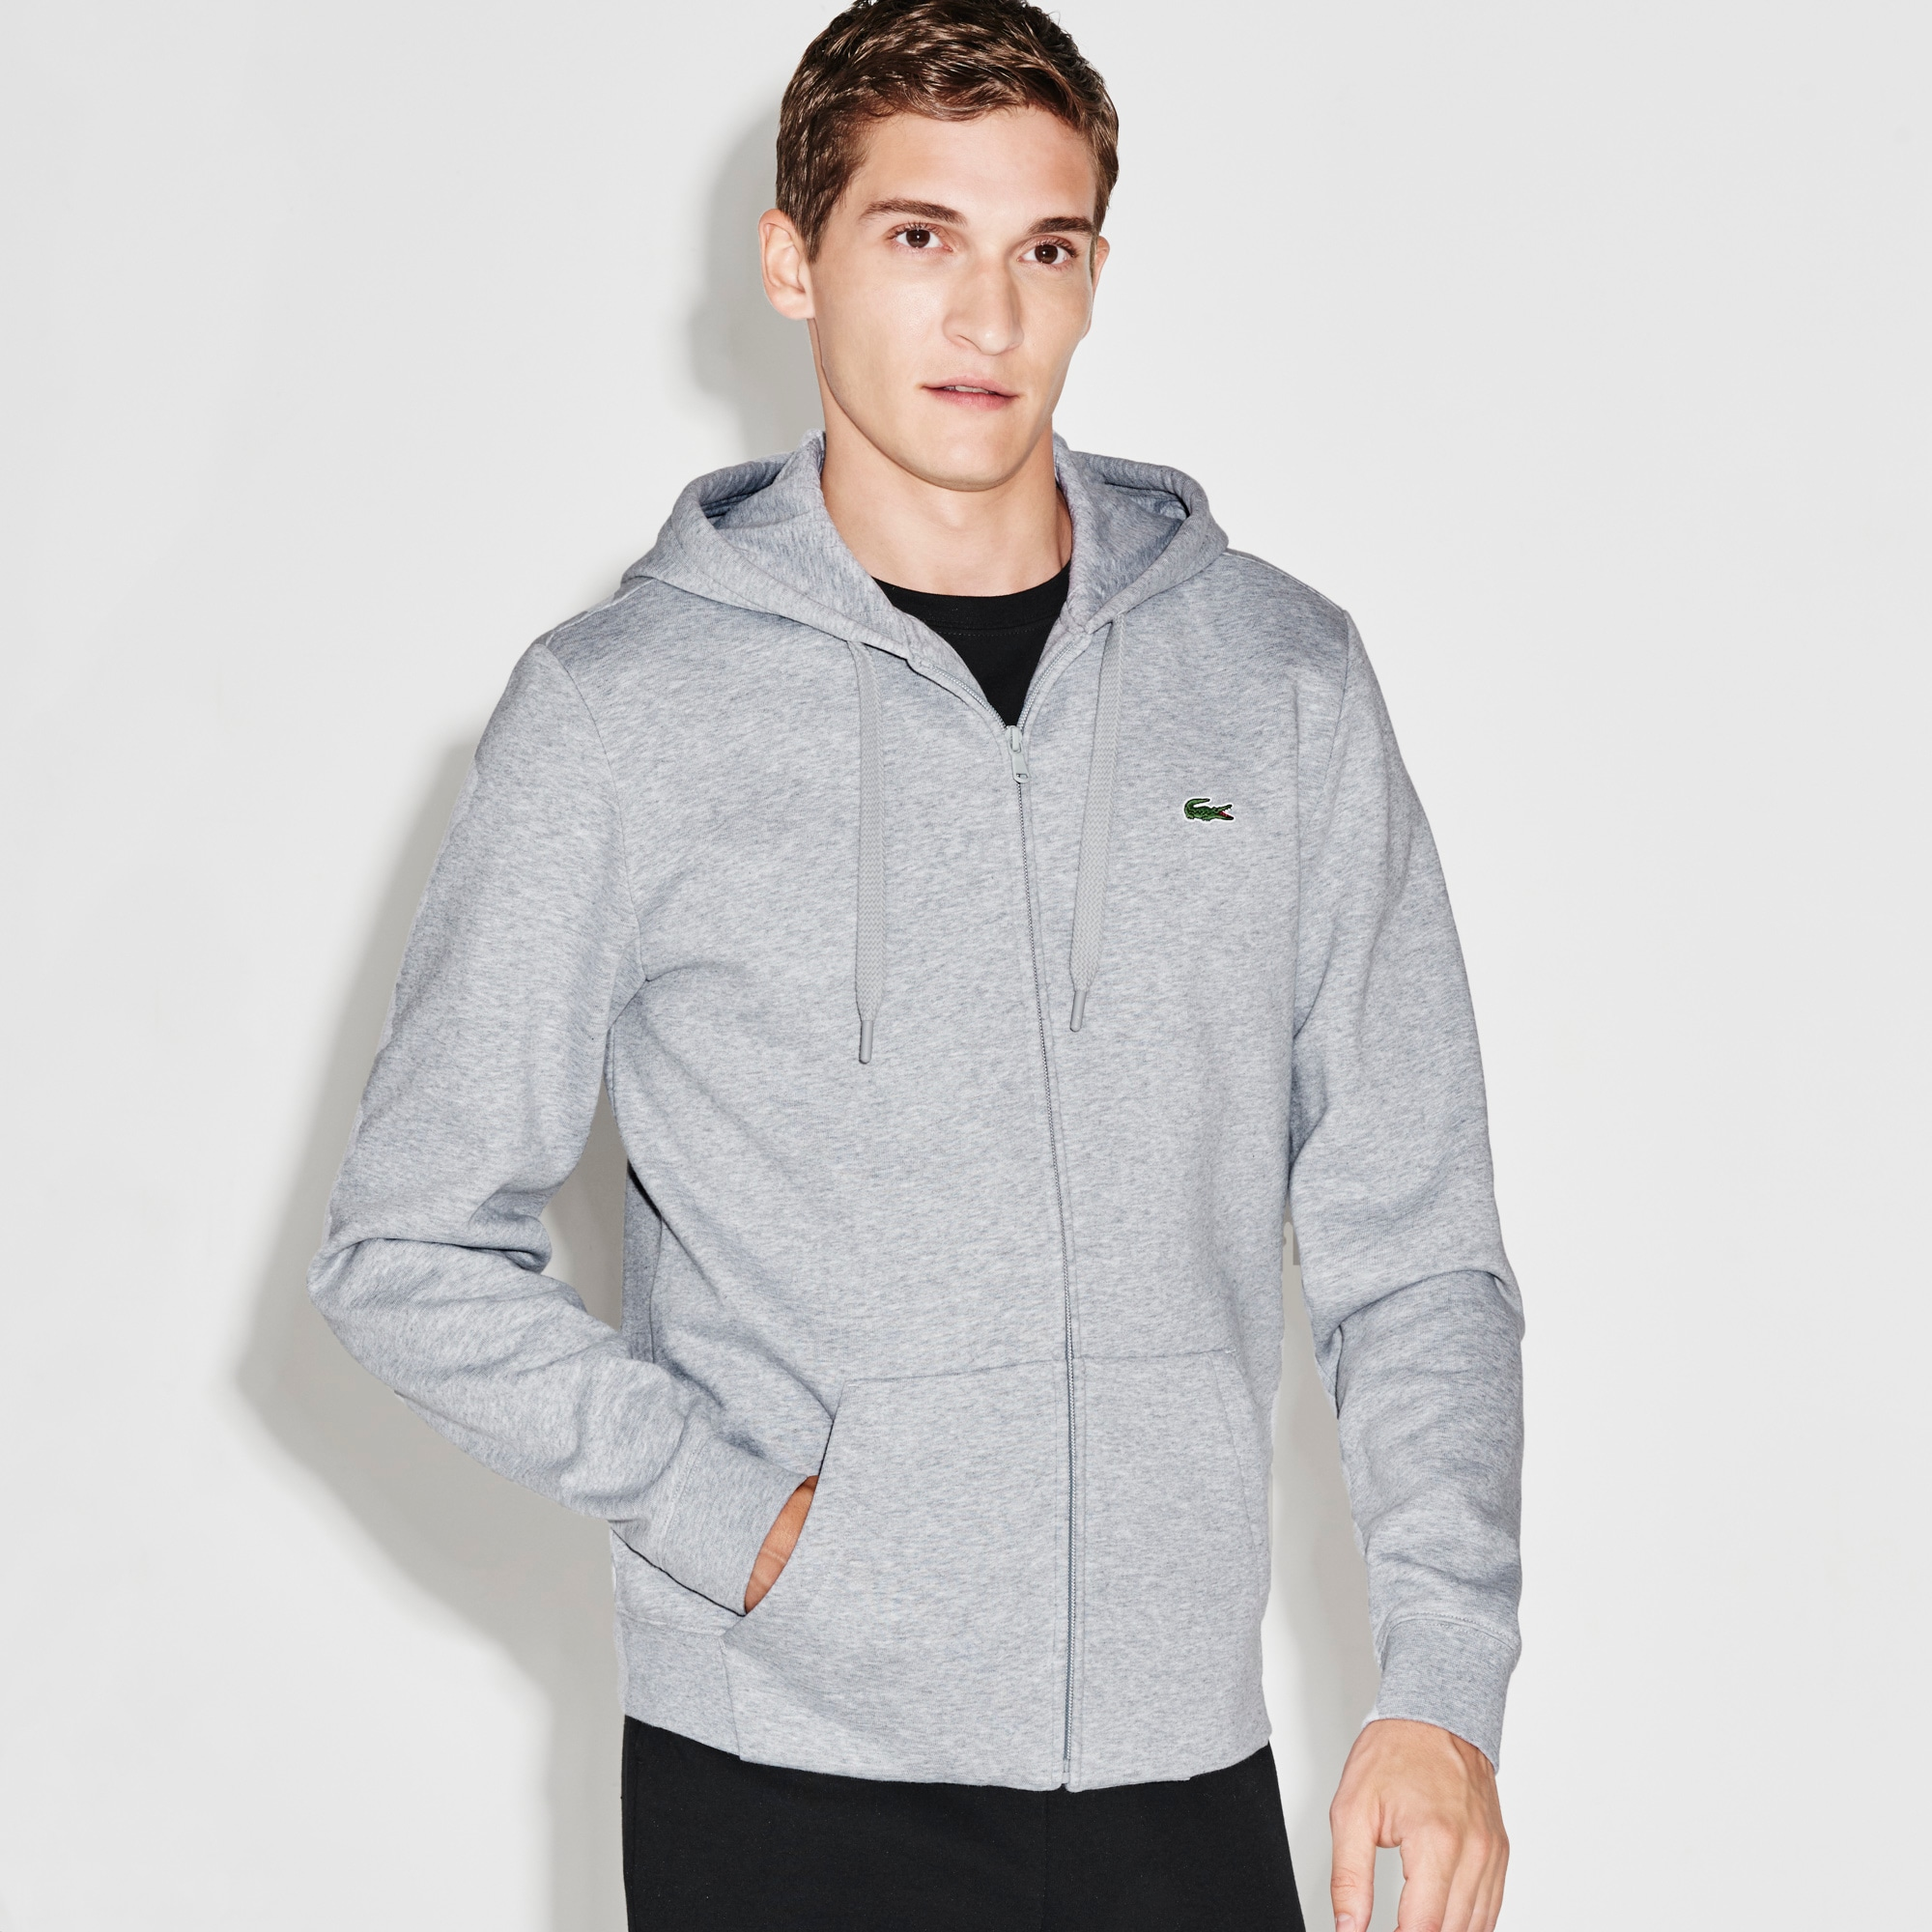 Men's SPORT Hooded Zippered Back Print Tennis Sweatshirt